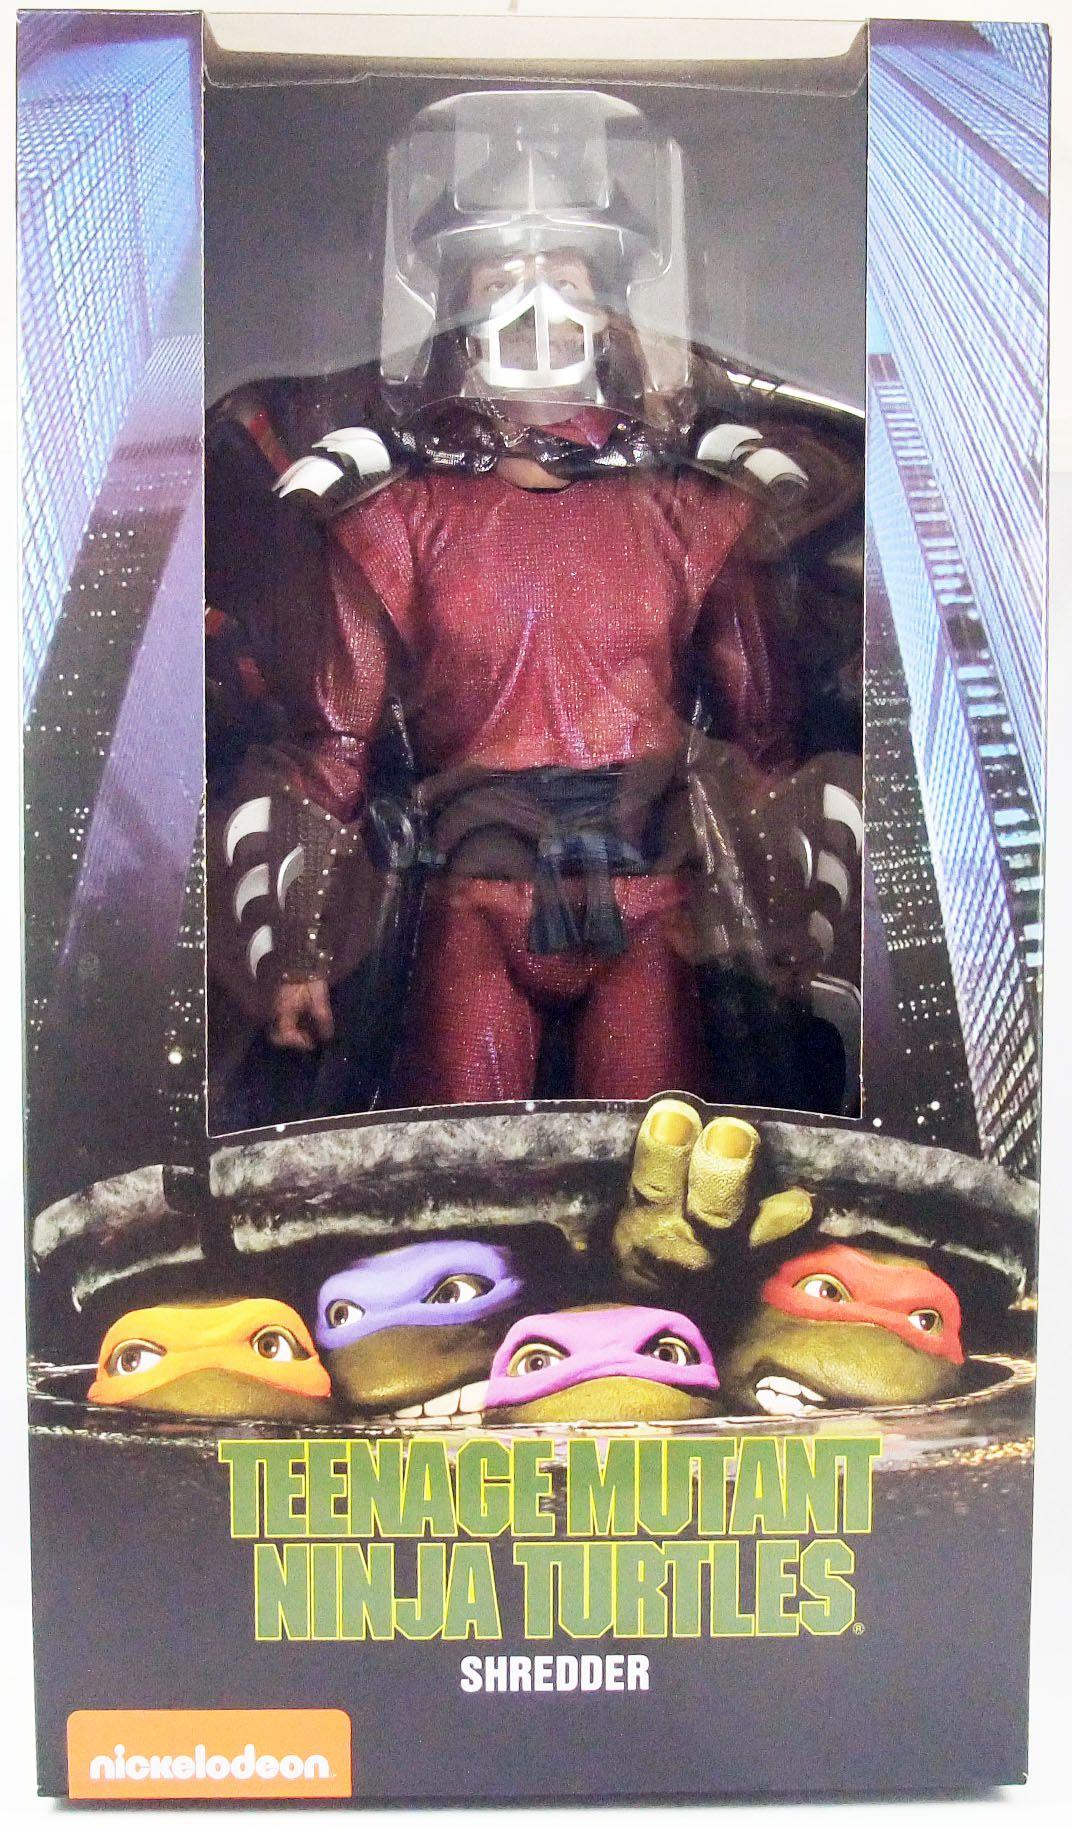 TMNT Tortues Ninja - NECA - 1/4 scale 1990 Movie Shredder